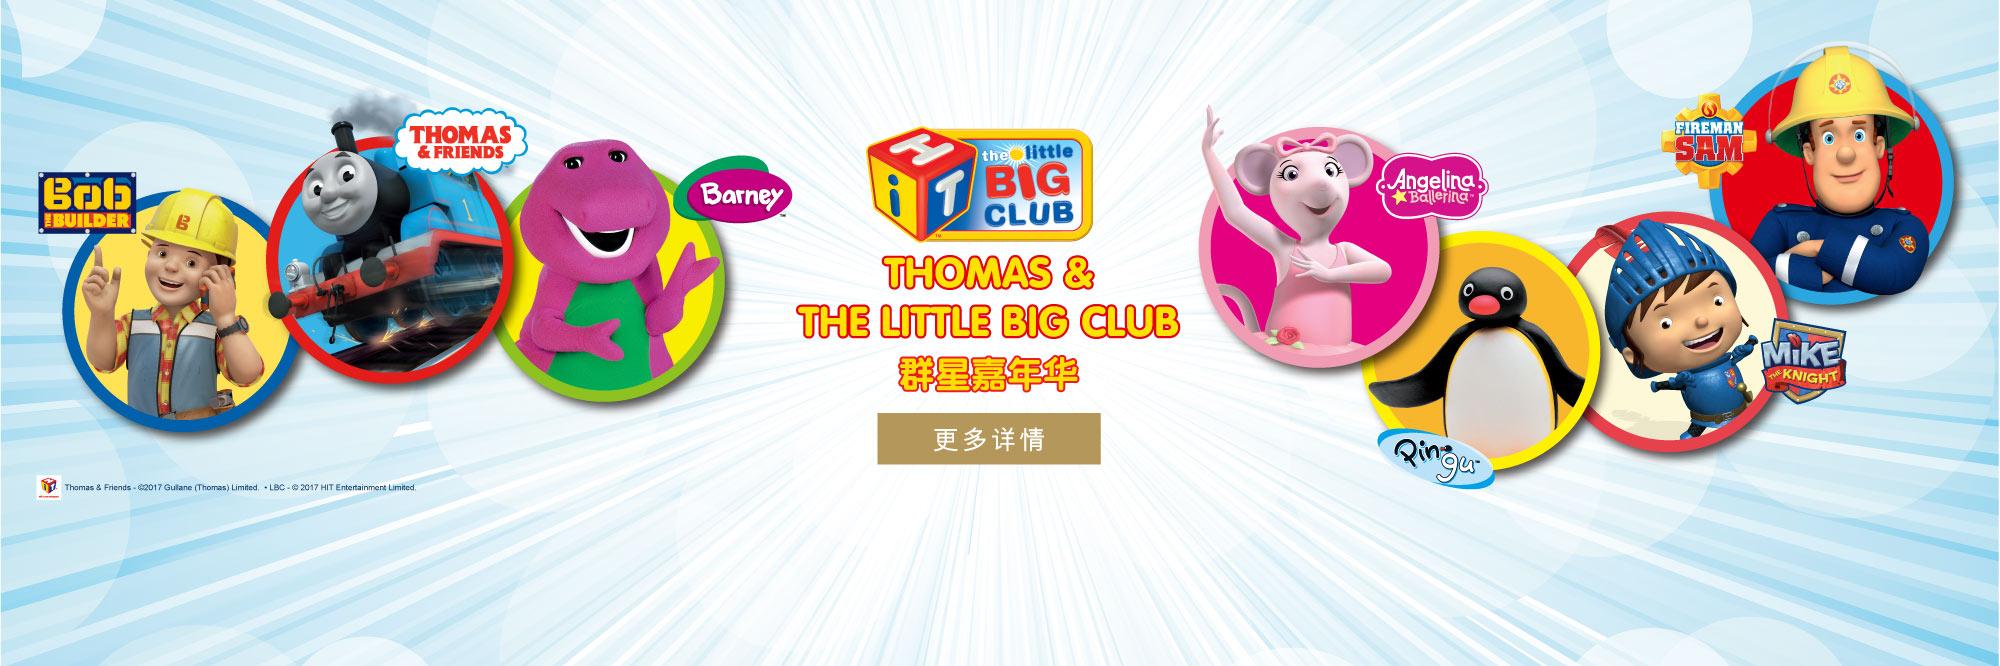 THOMAS & THE LITTLE BIG CLUB 群星嘉年华